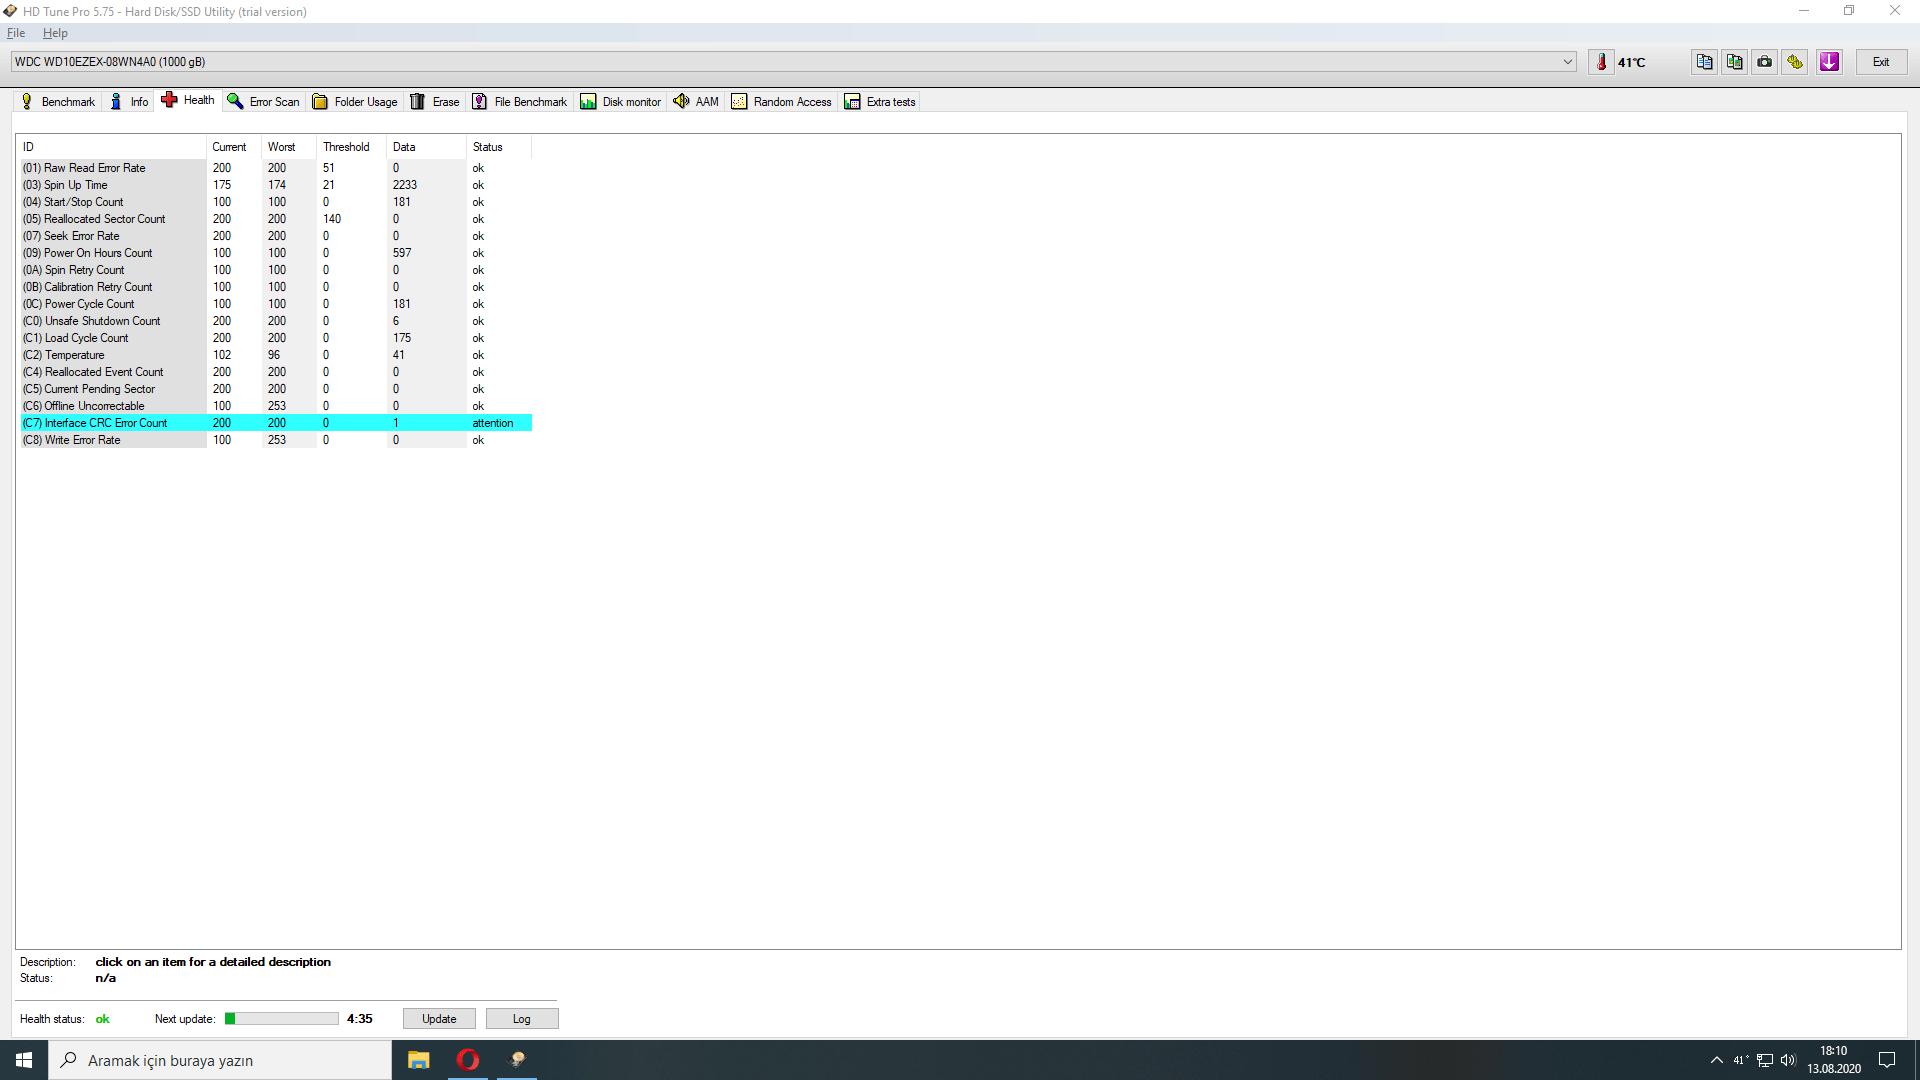 desktop-screenshot-2020-08-13-18-10-47-83-png.638325